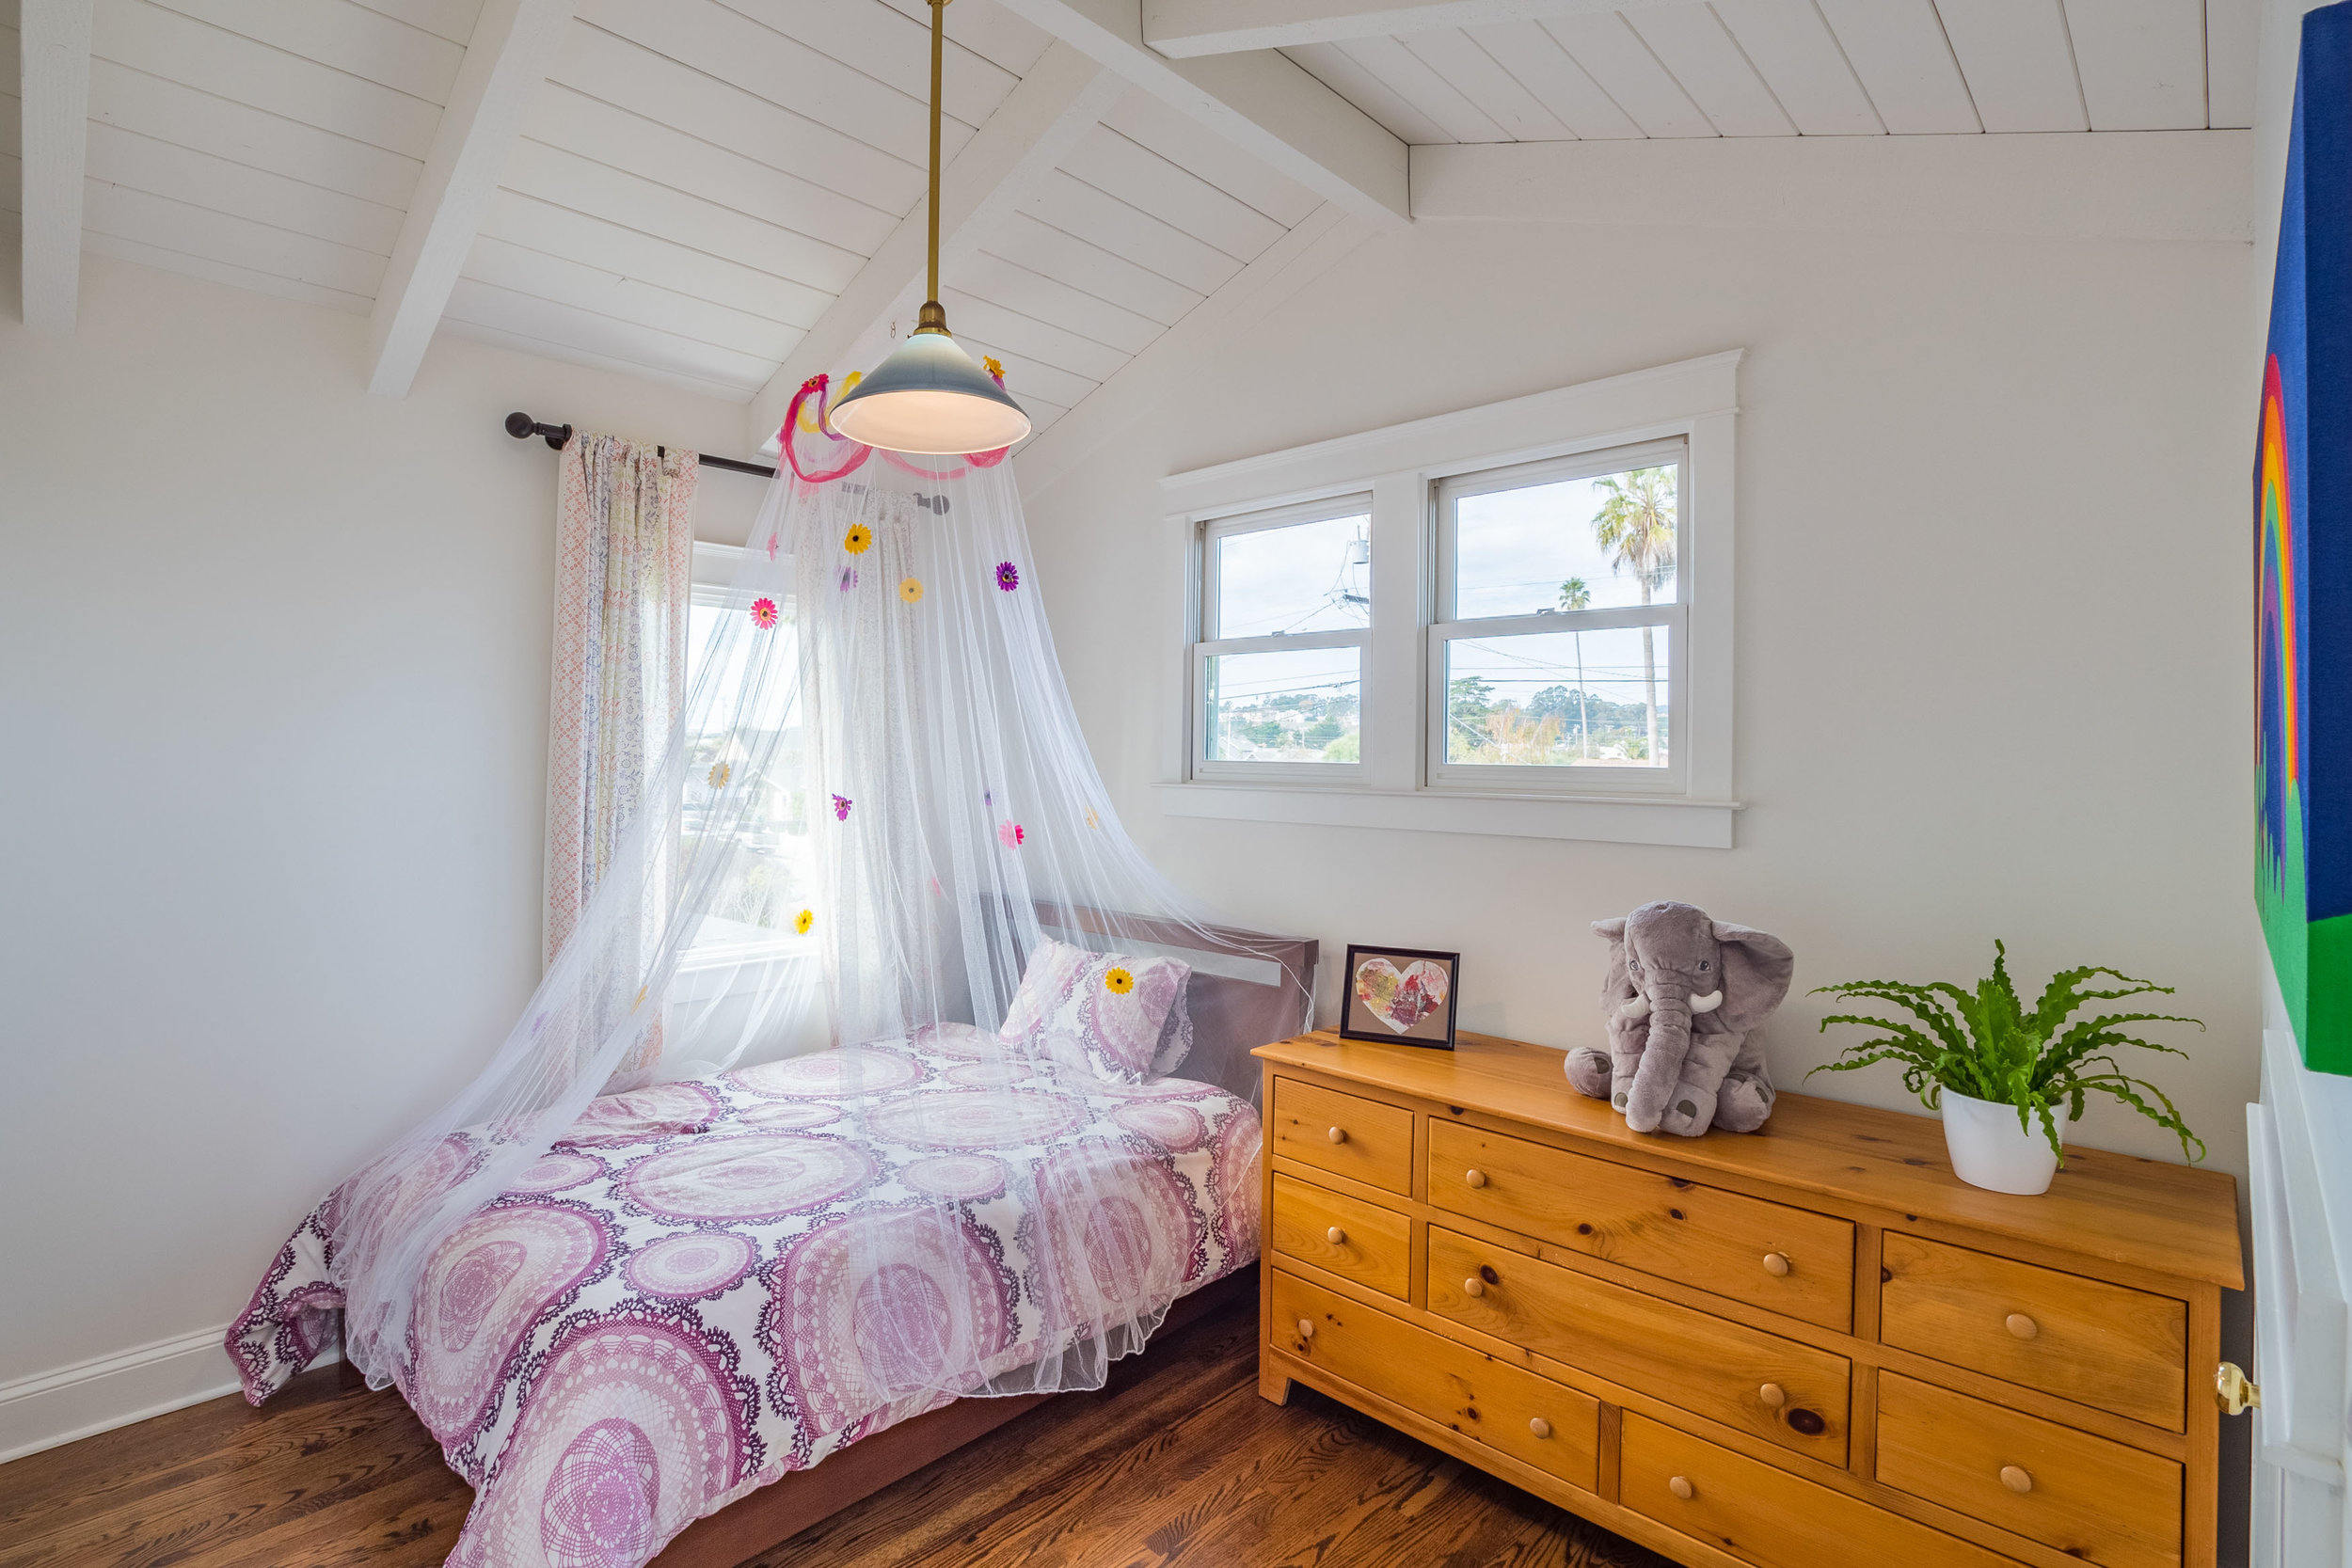 3 Bedroom 2 Bathroom 2100+ Sq Ft House in Santa Cruz, California